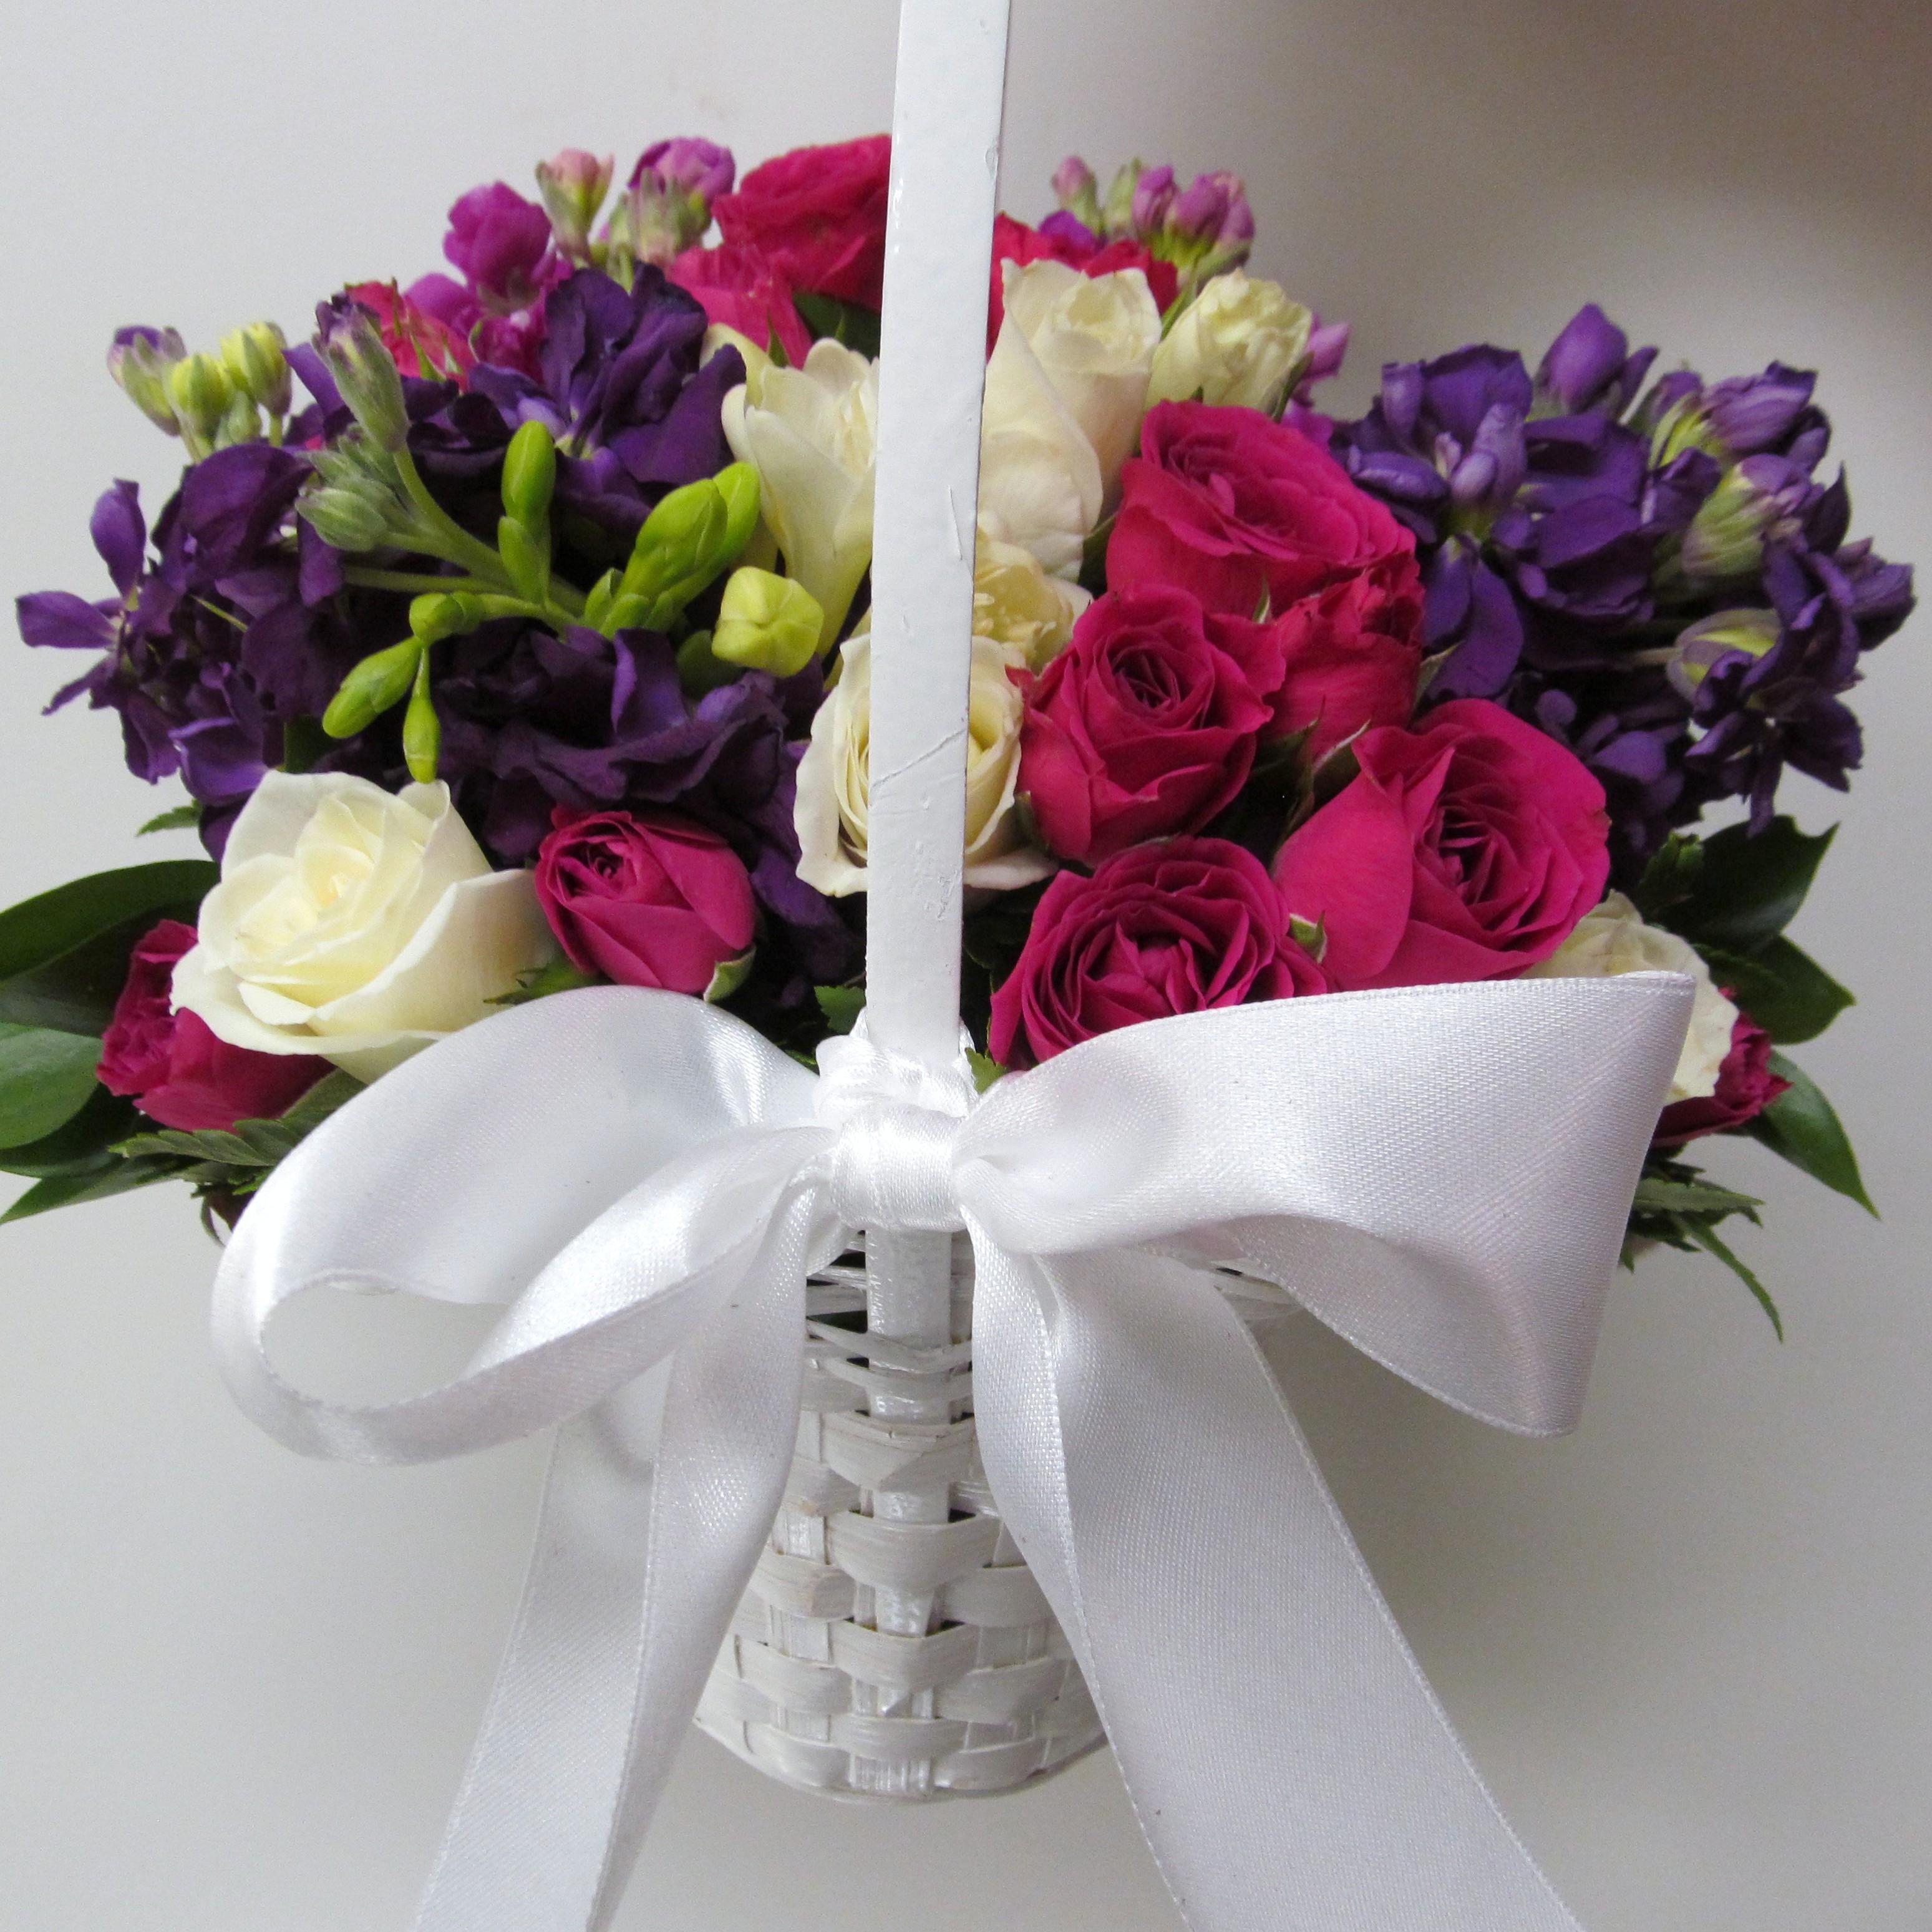 Wedding flowers buffalo ny buffalo wedding event flowers by the lafayette buffalo ny wedding florist izmirmasajfo